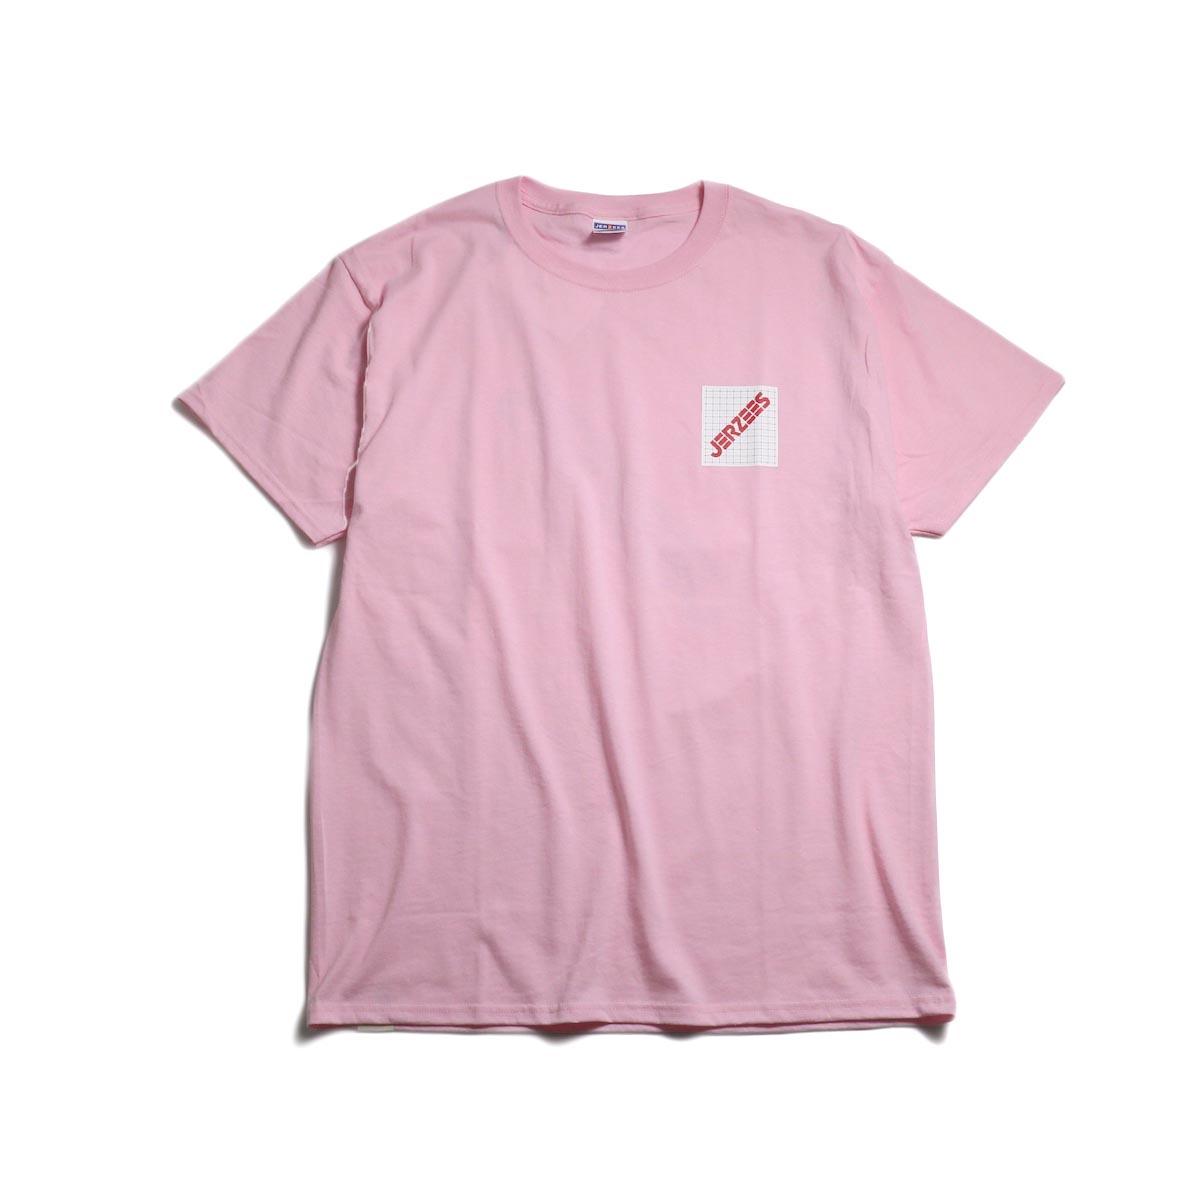 N.HOOLYWOOD × JERZEES  / 191-CS44-070 Short Sleeve Tee -Pink